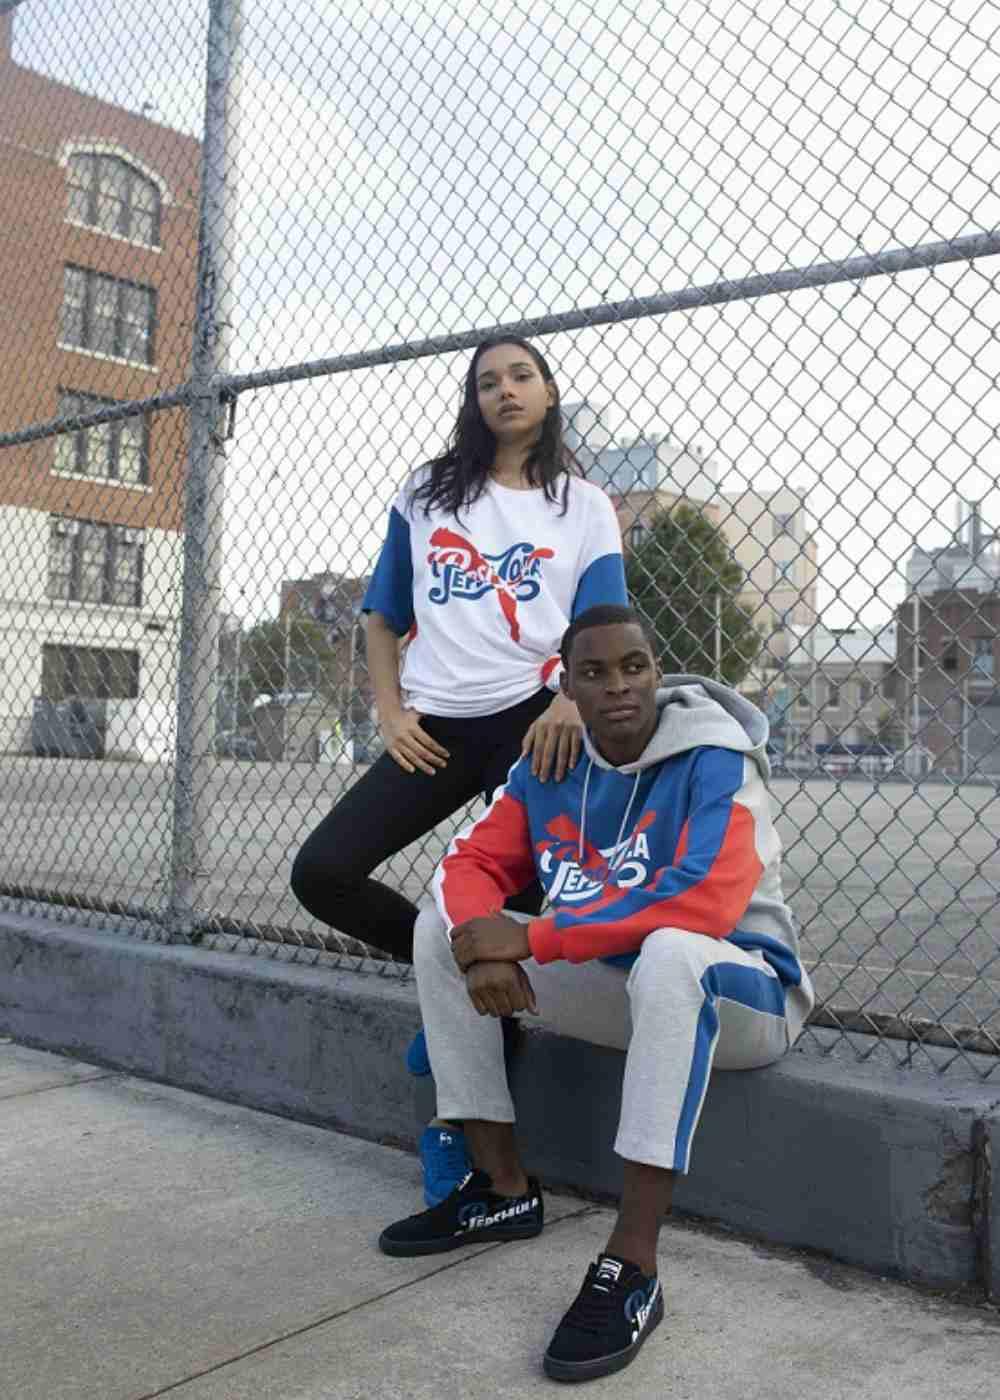 Lifestyle PUMA x Pepsi Cola Puma Suede 50 - Suede 50 PUMA x Pepsi Cola 联手重塑50周年经典潮流